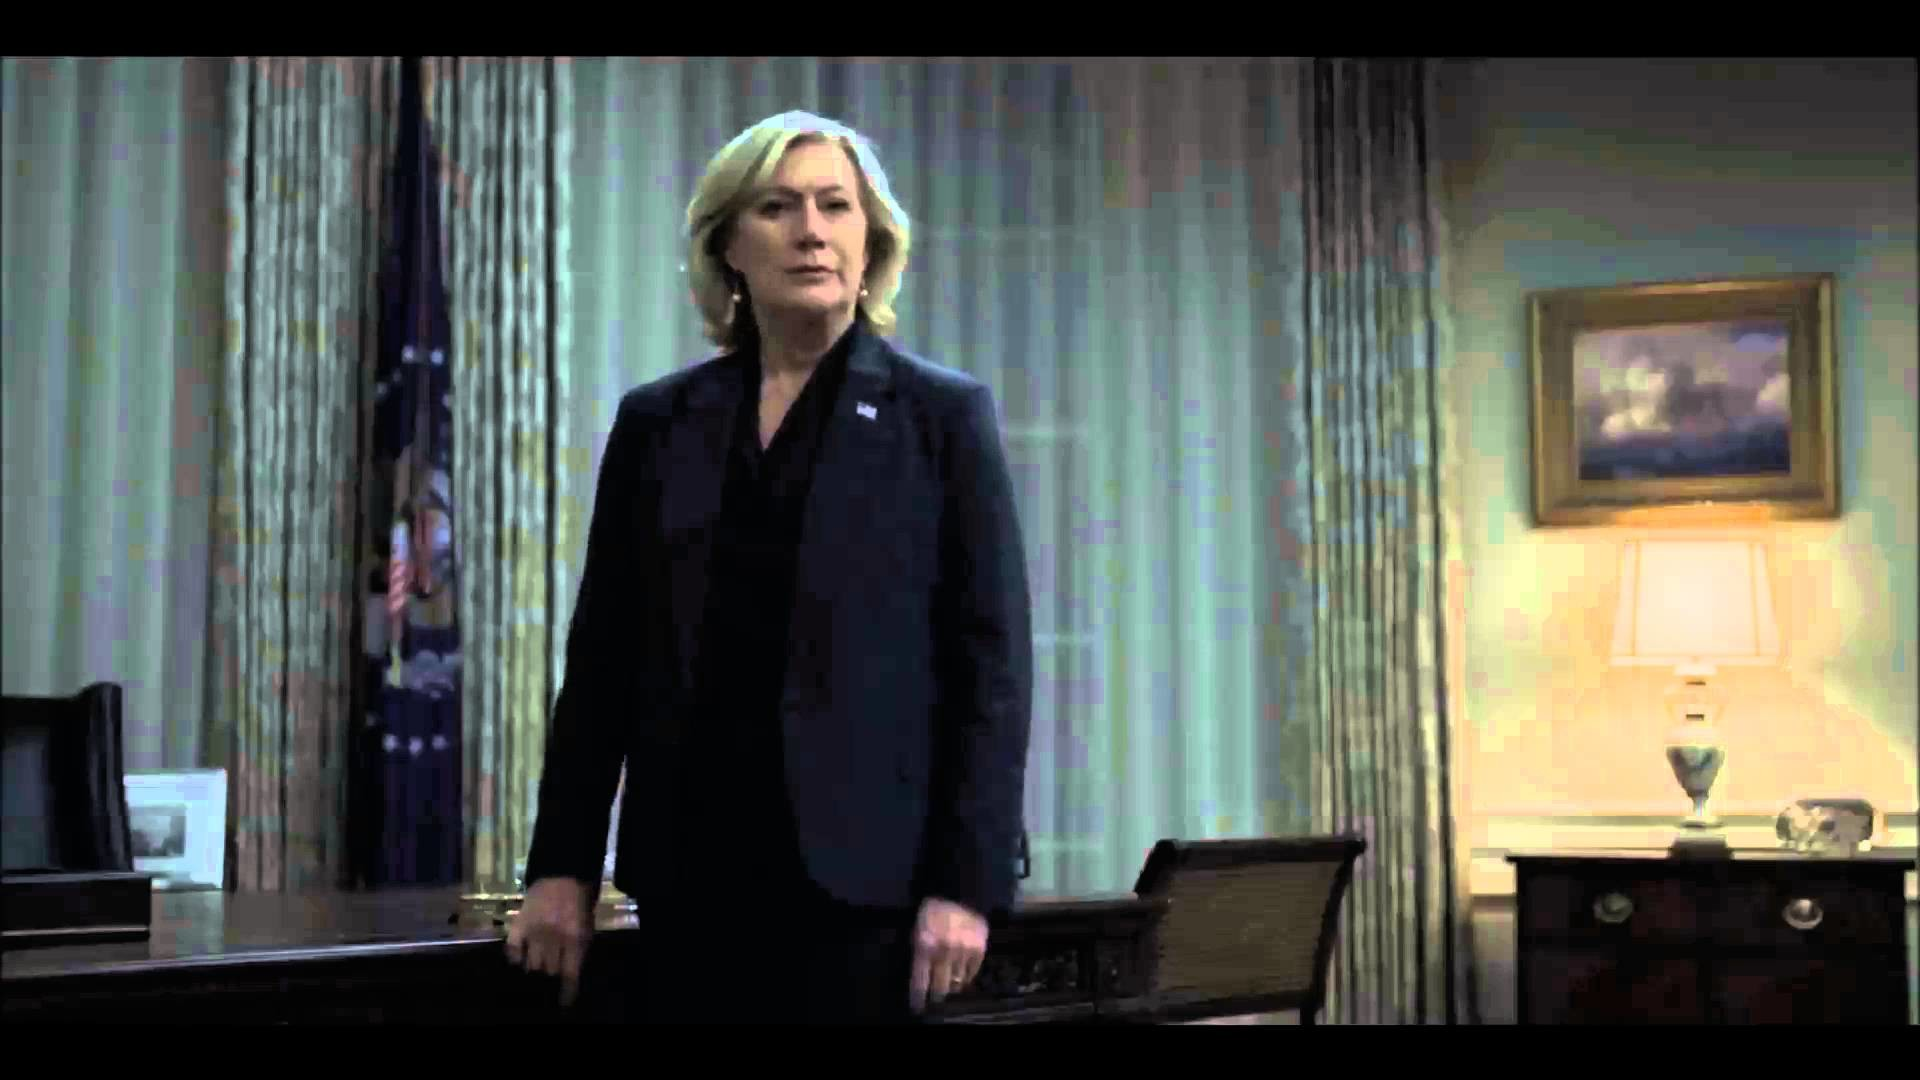 House of Cards: Season 4 Frank threatens Durant